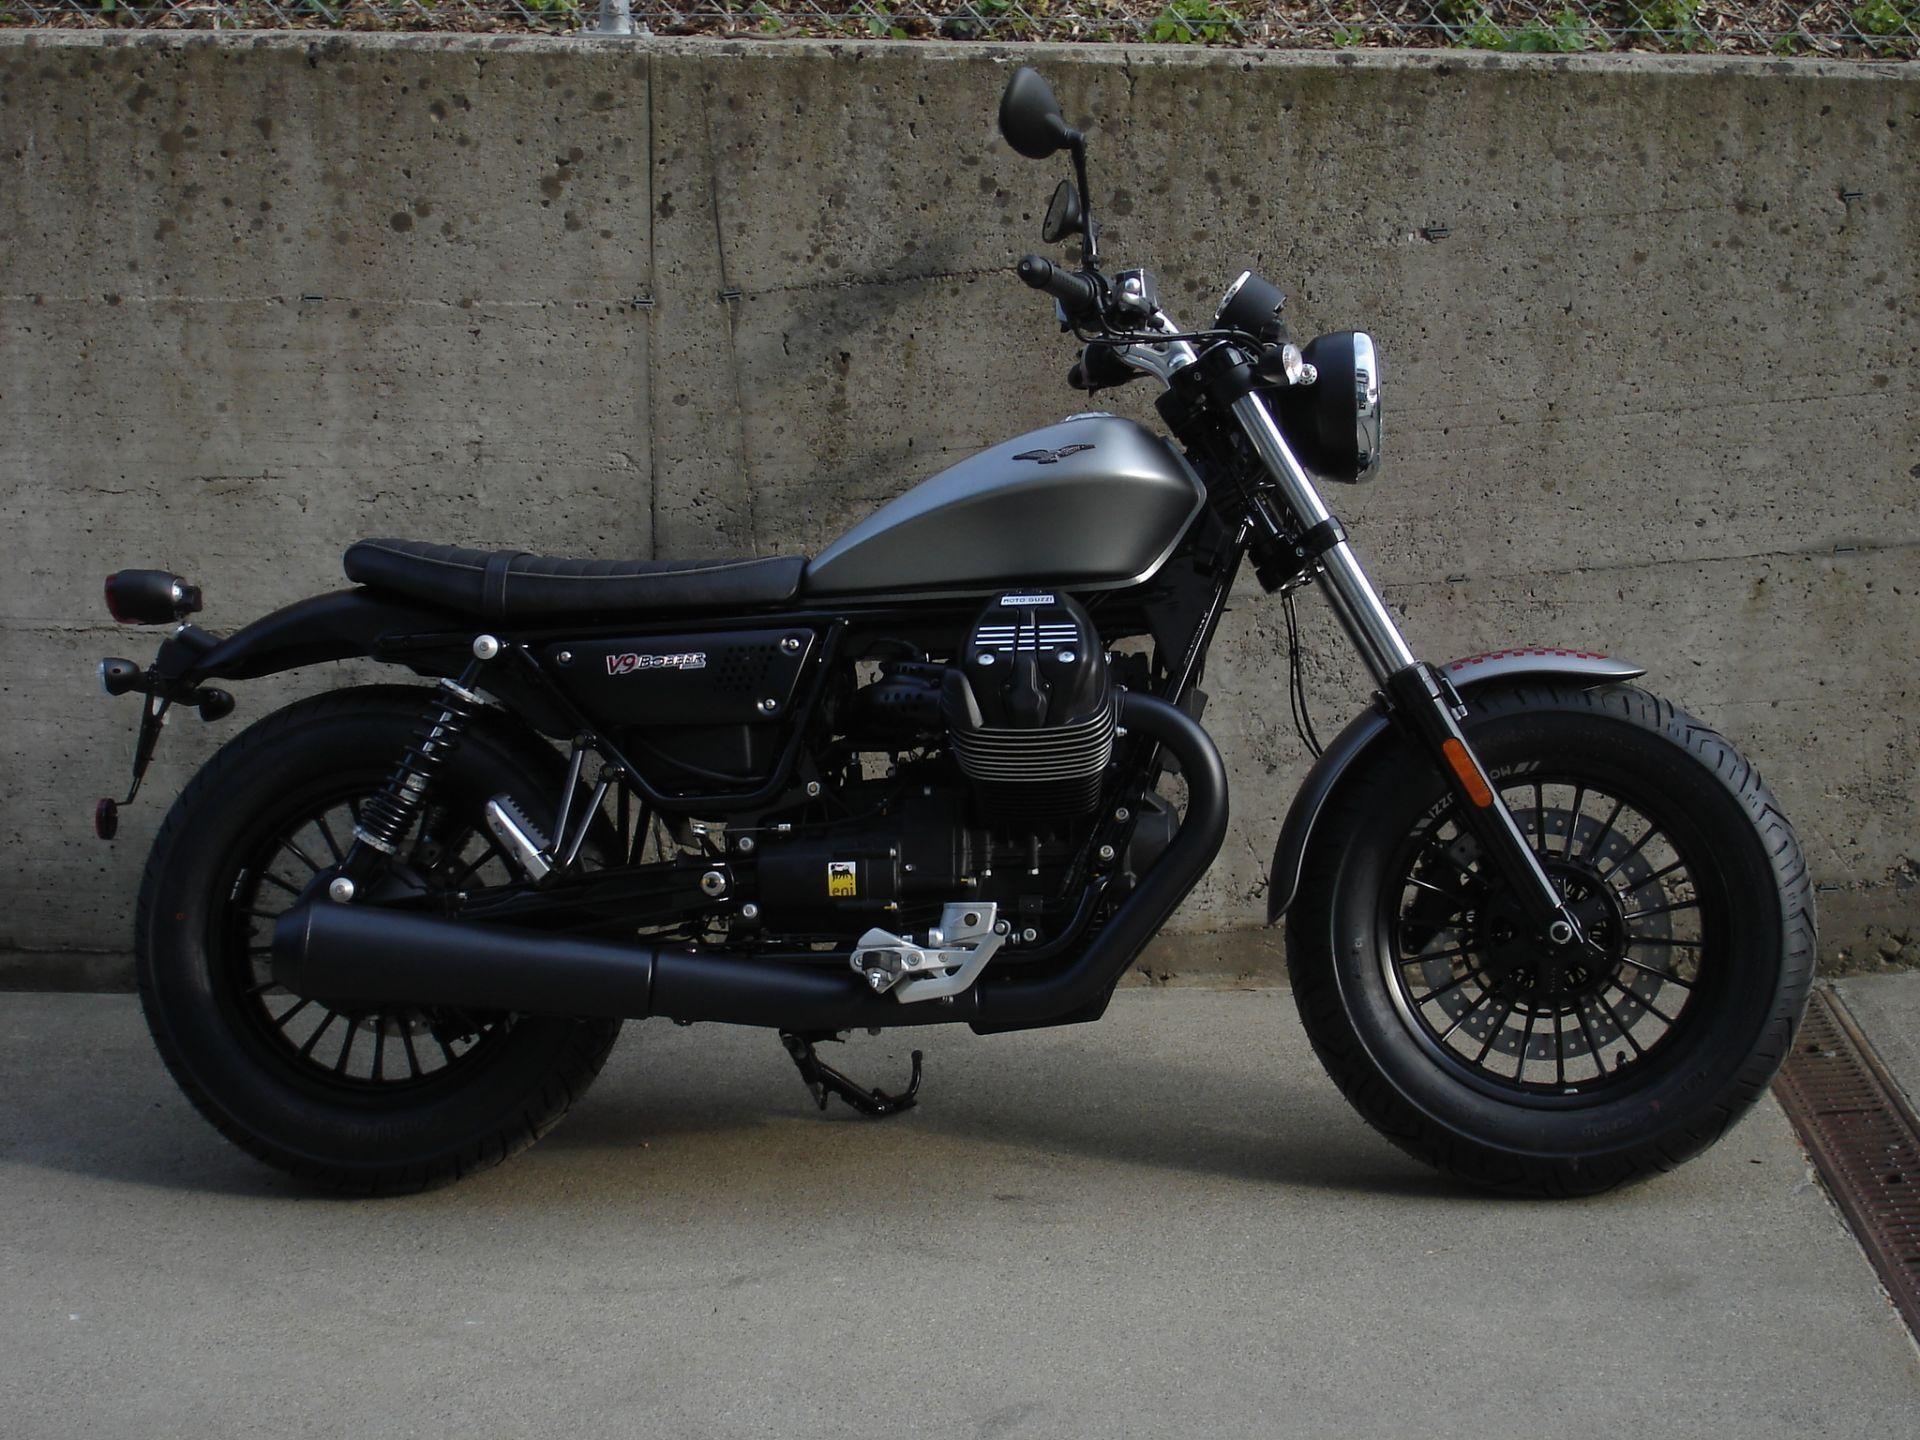 motorrad neufahrzeug kaufen moto guzzi v9 bobber abs la. Black Bedroom Furniture Sets. Home Design Ideas